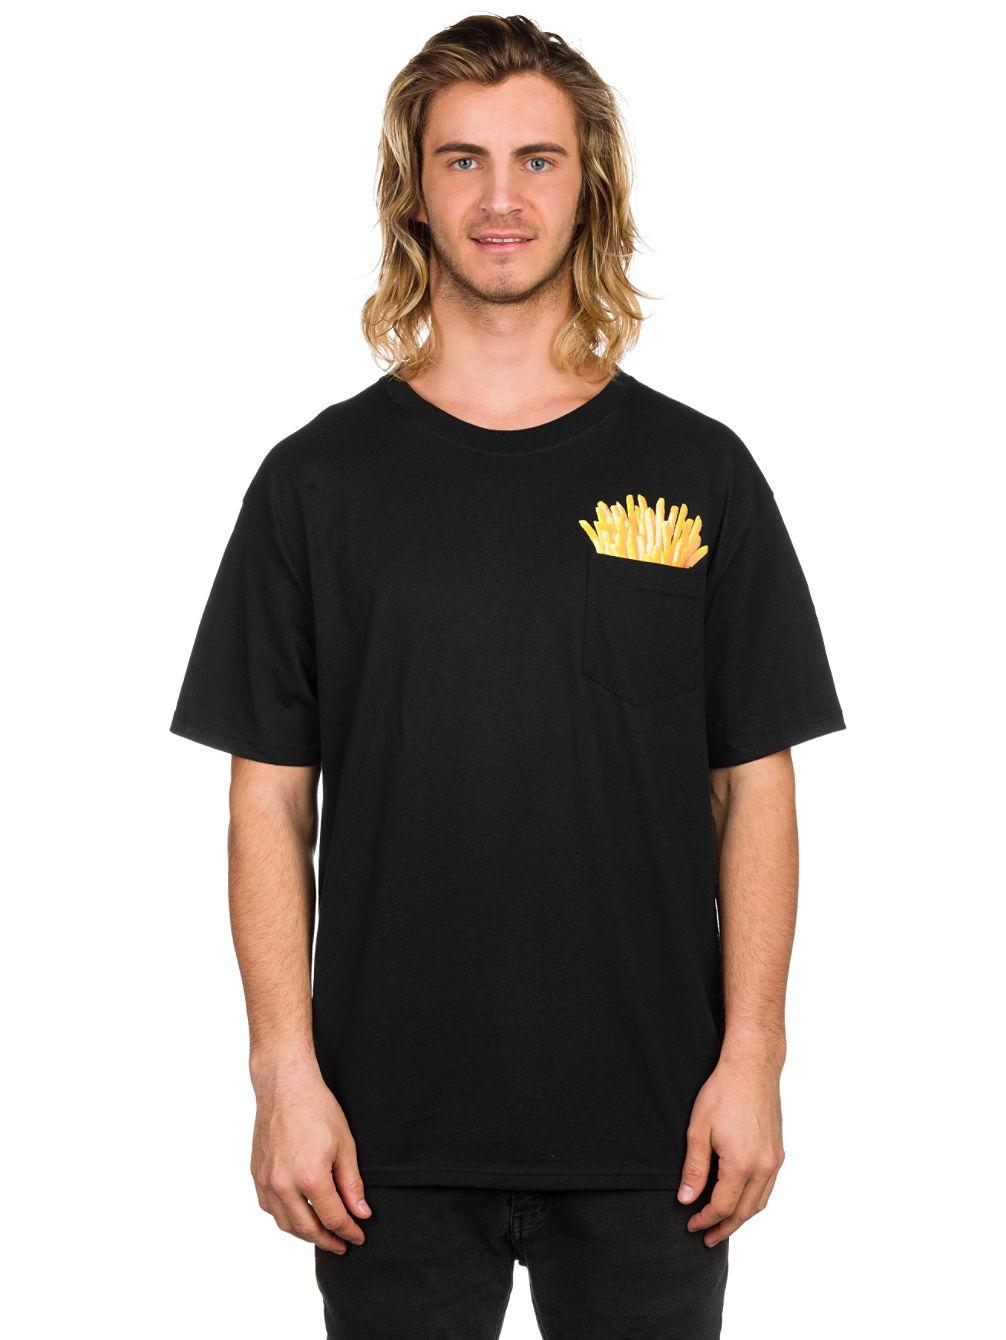 fry-supply-pocket-t-shirt